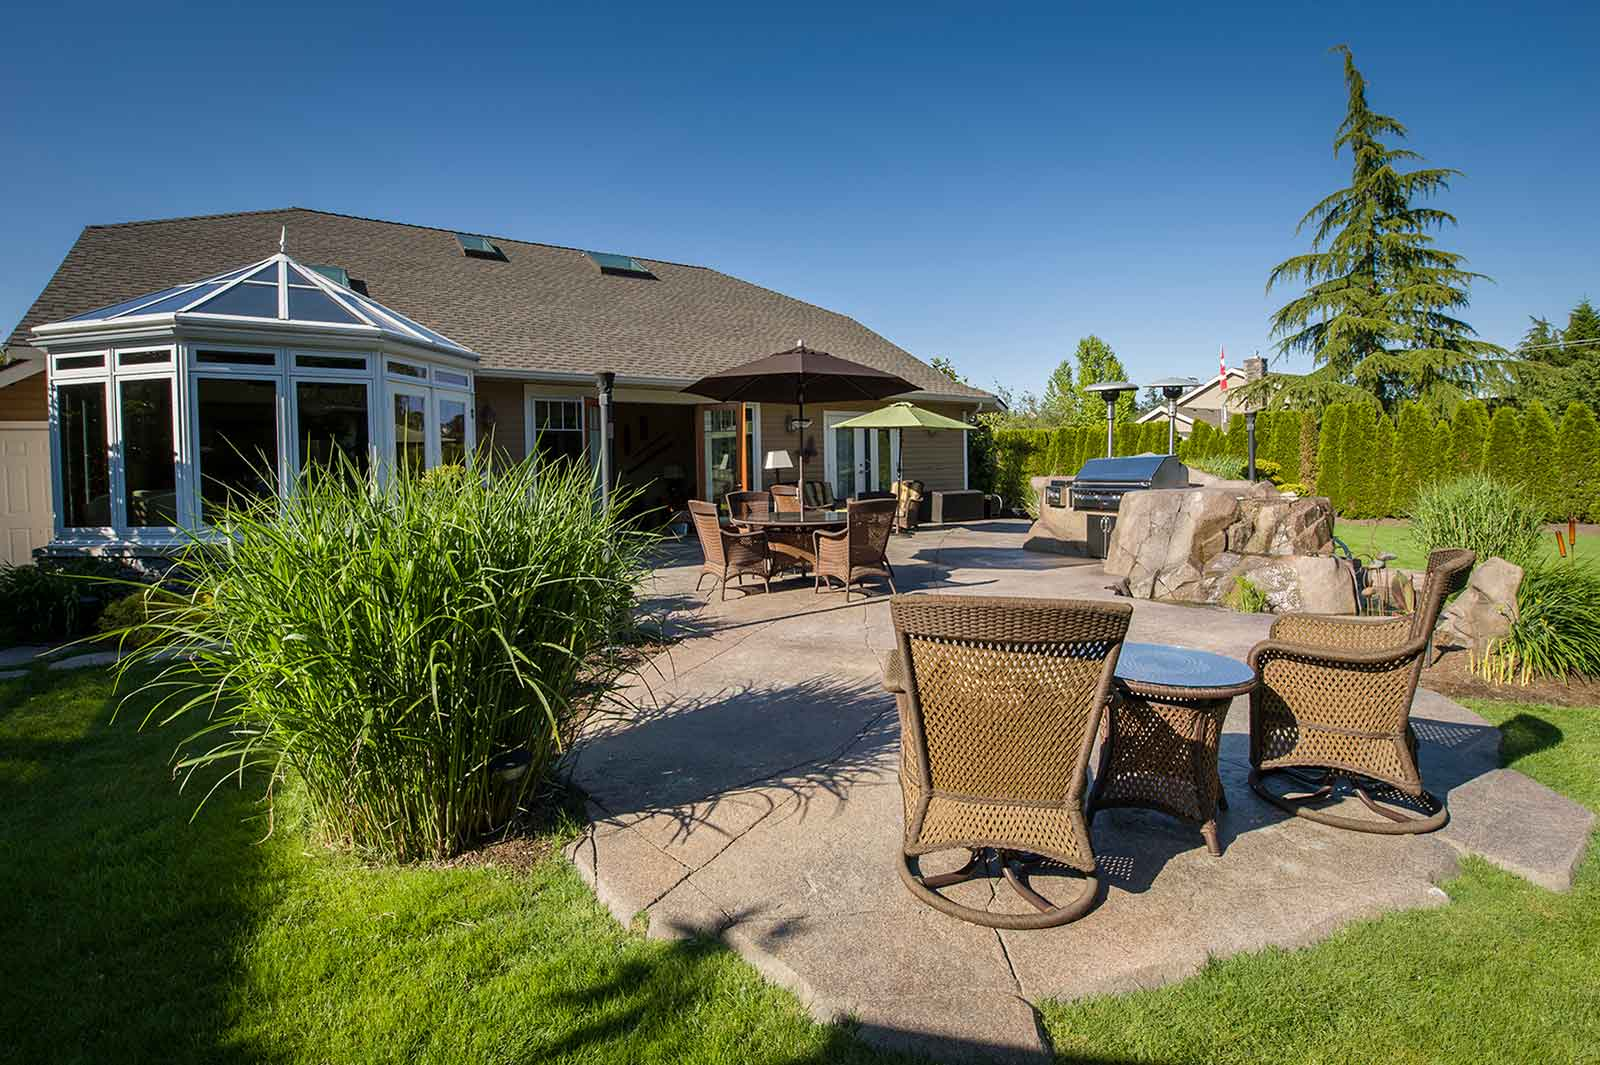 Beautiful backyard patio design